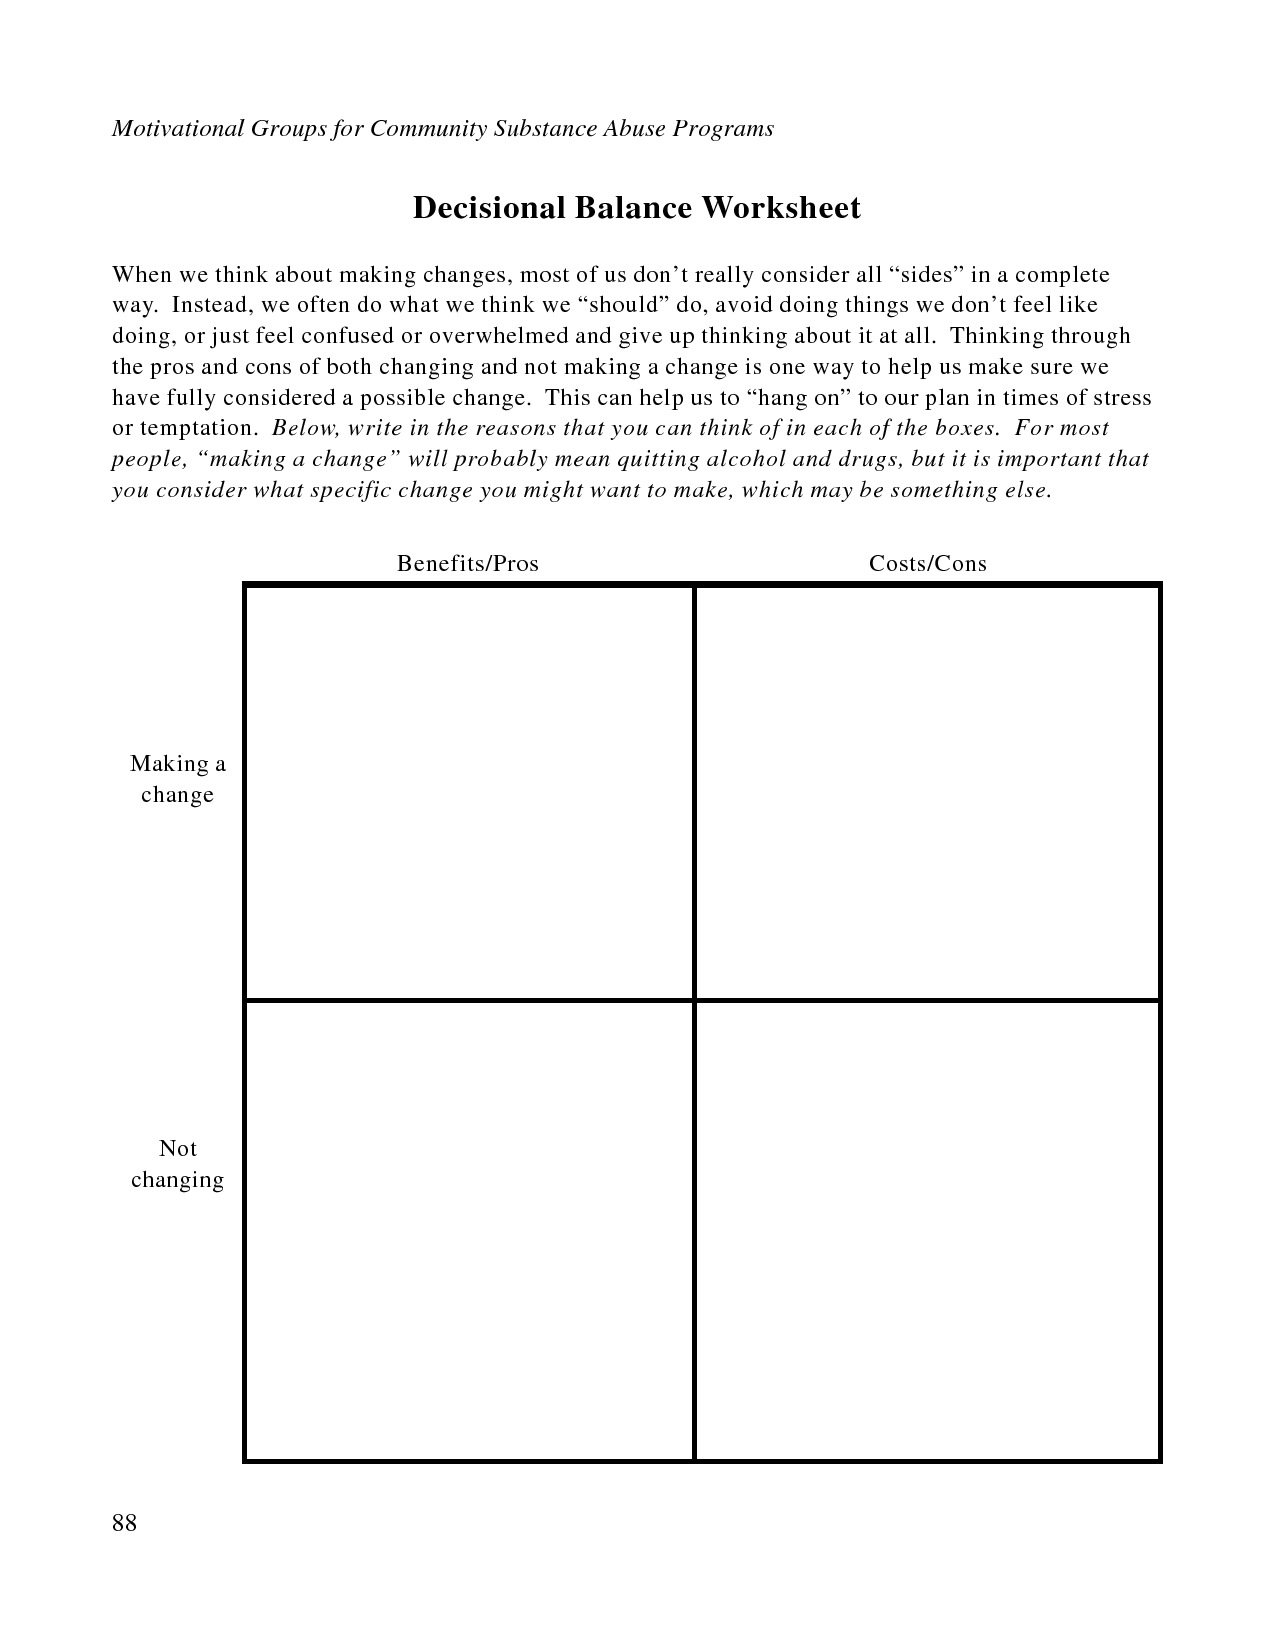 Free Printable Dbt Worksheets | Decisional Balance Worksheet - Pdf | Free Printable Therapy Worksheets